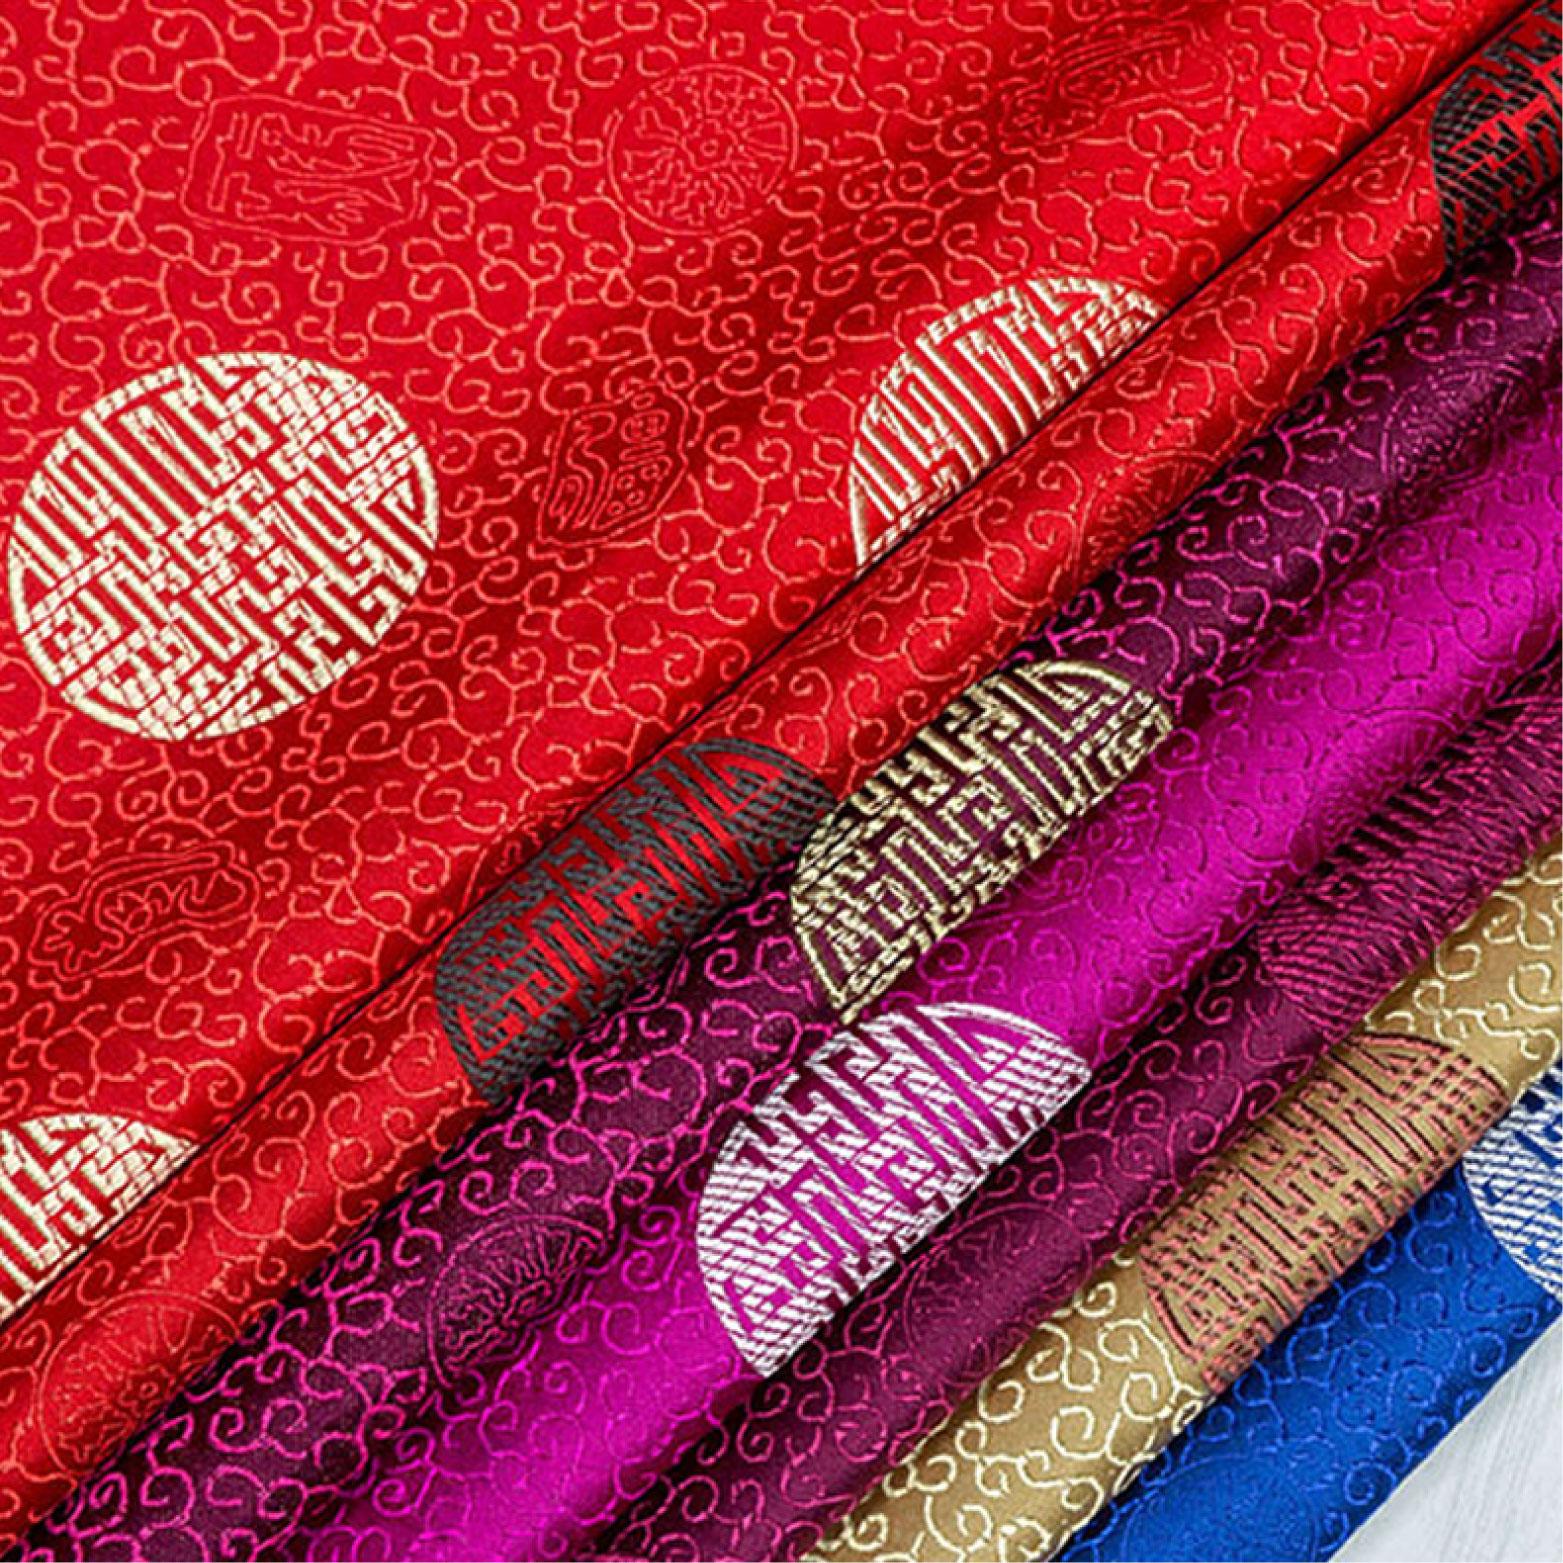 Didamao Vintage Cushion Chinese Satin Fabric Jacquard Silk Brocade